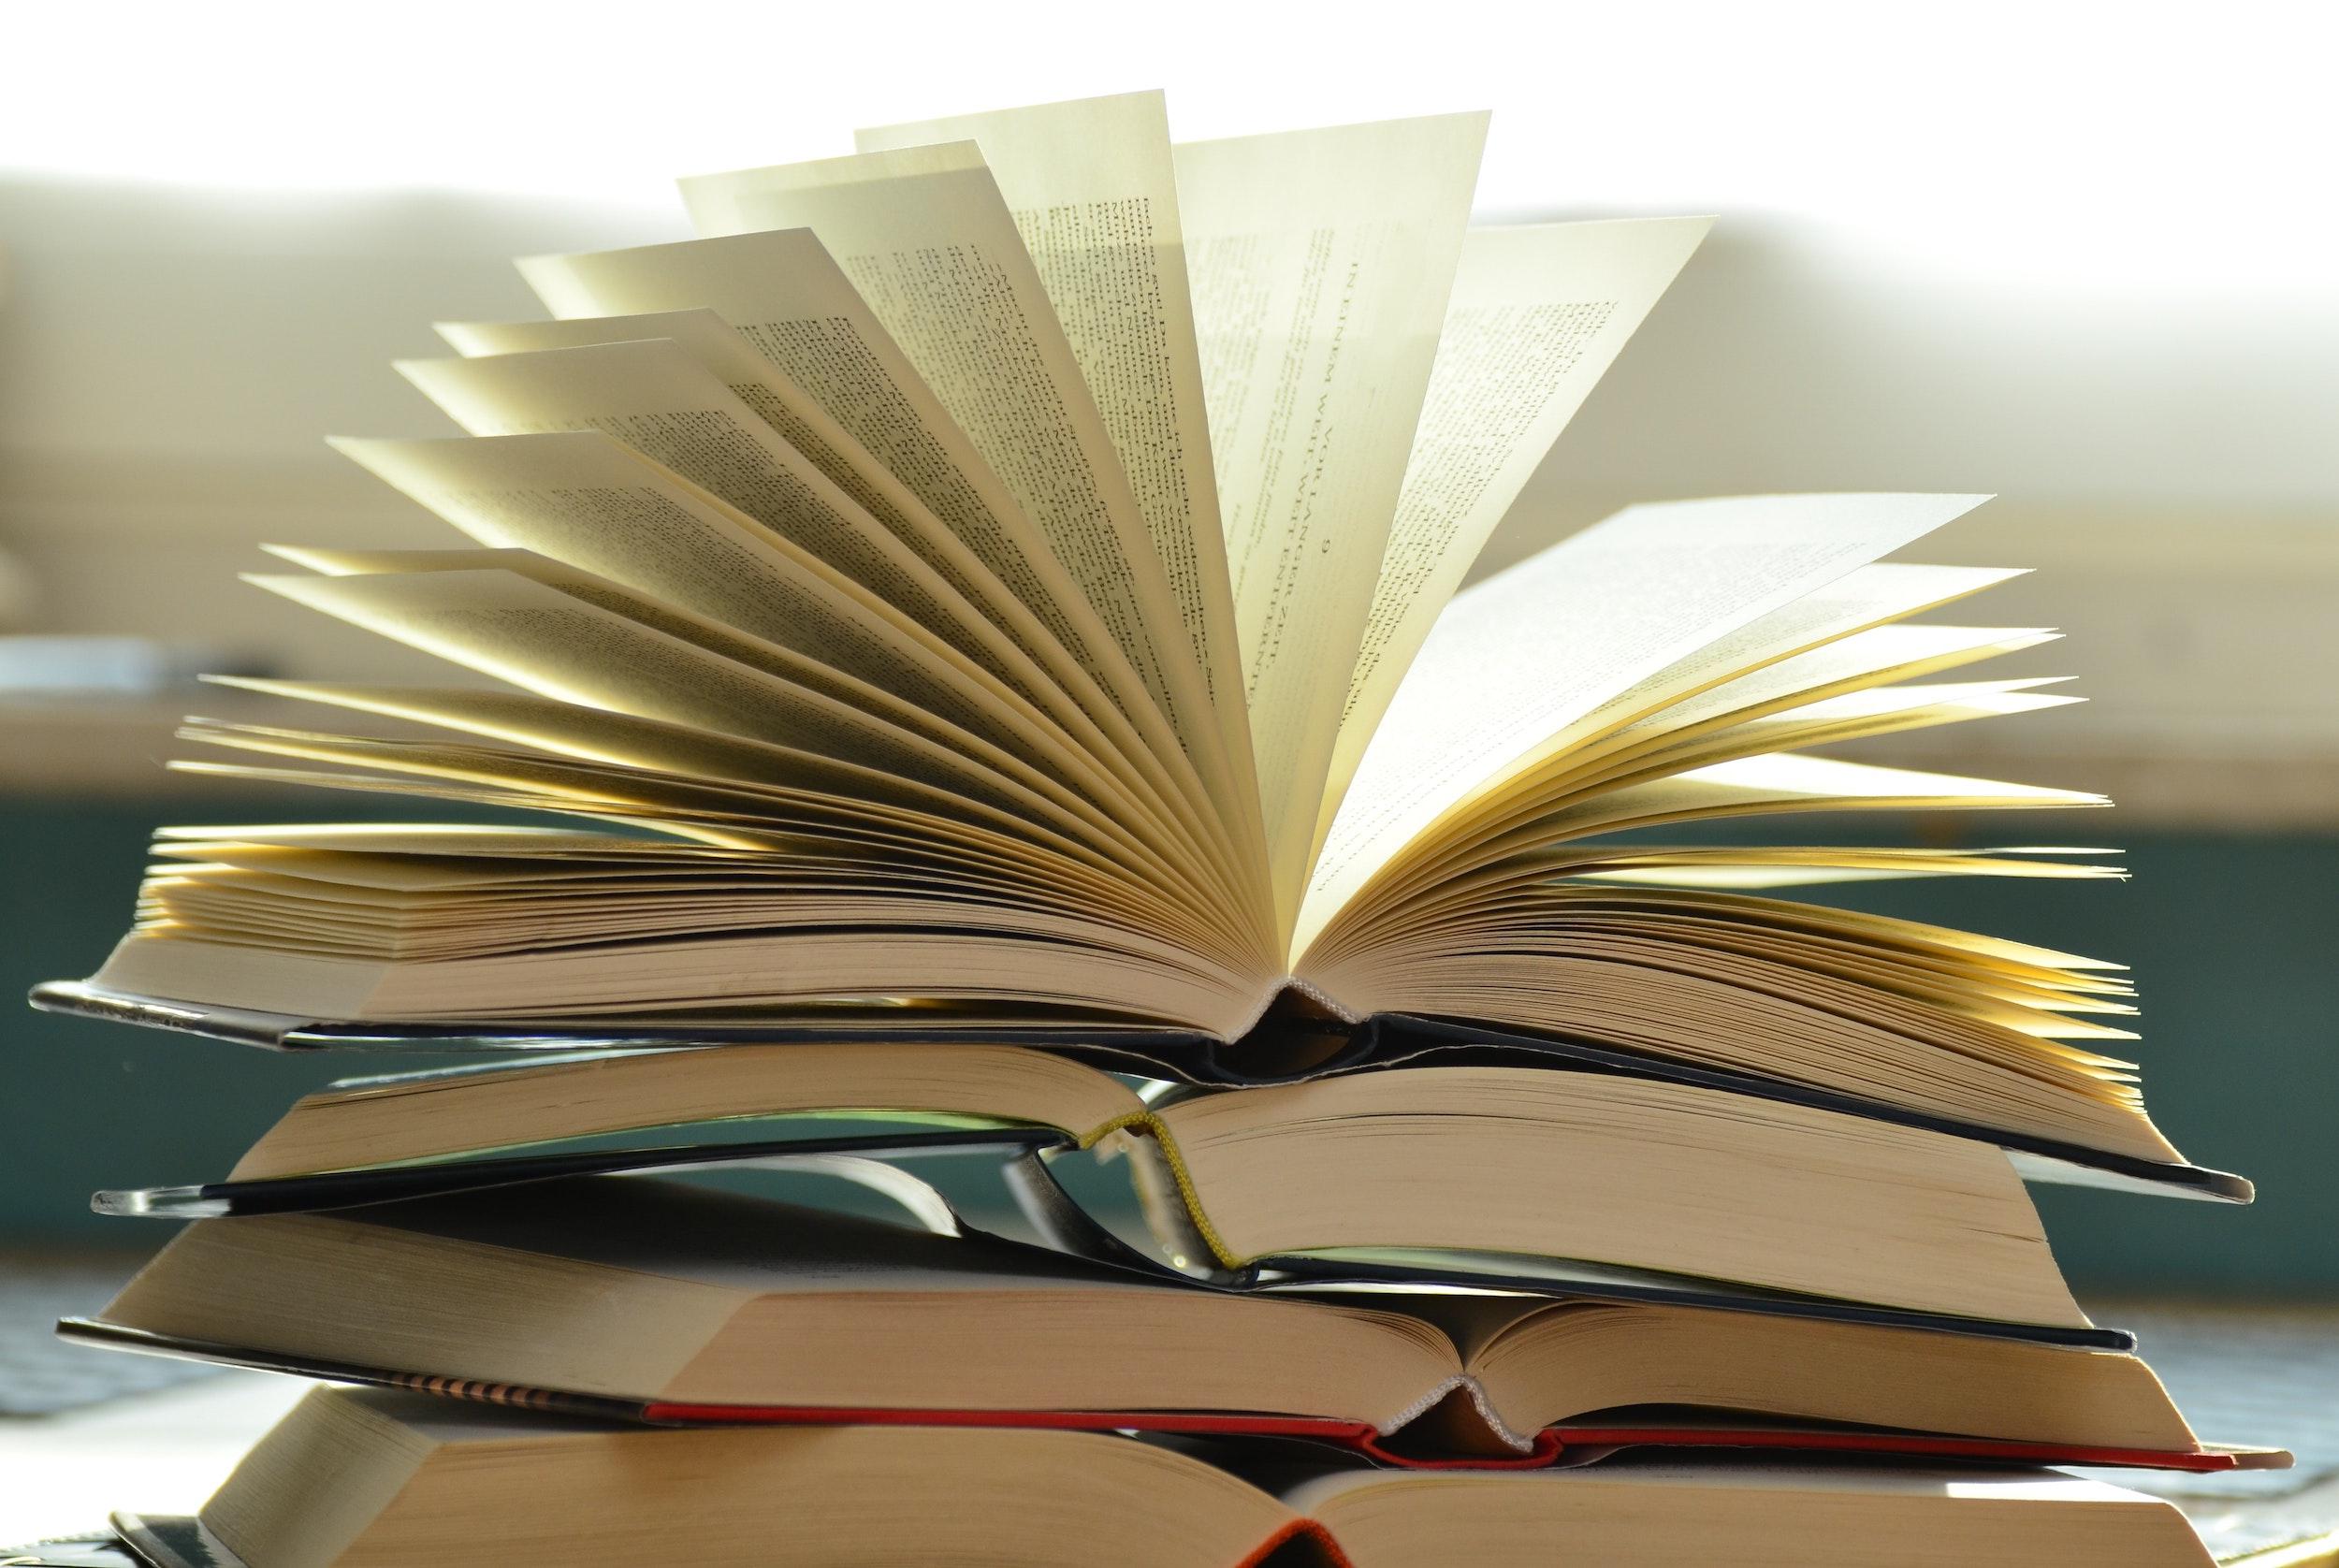 Cambridge Delta modules will definitely increase your language knowledge as a teacher